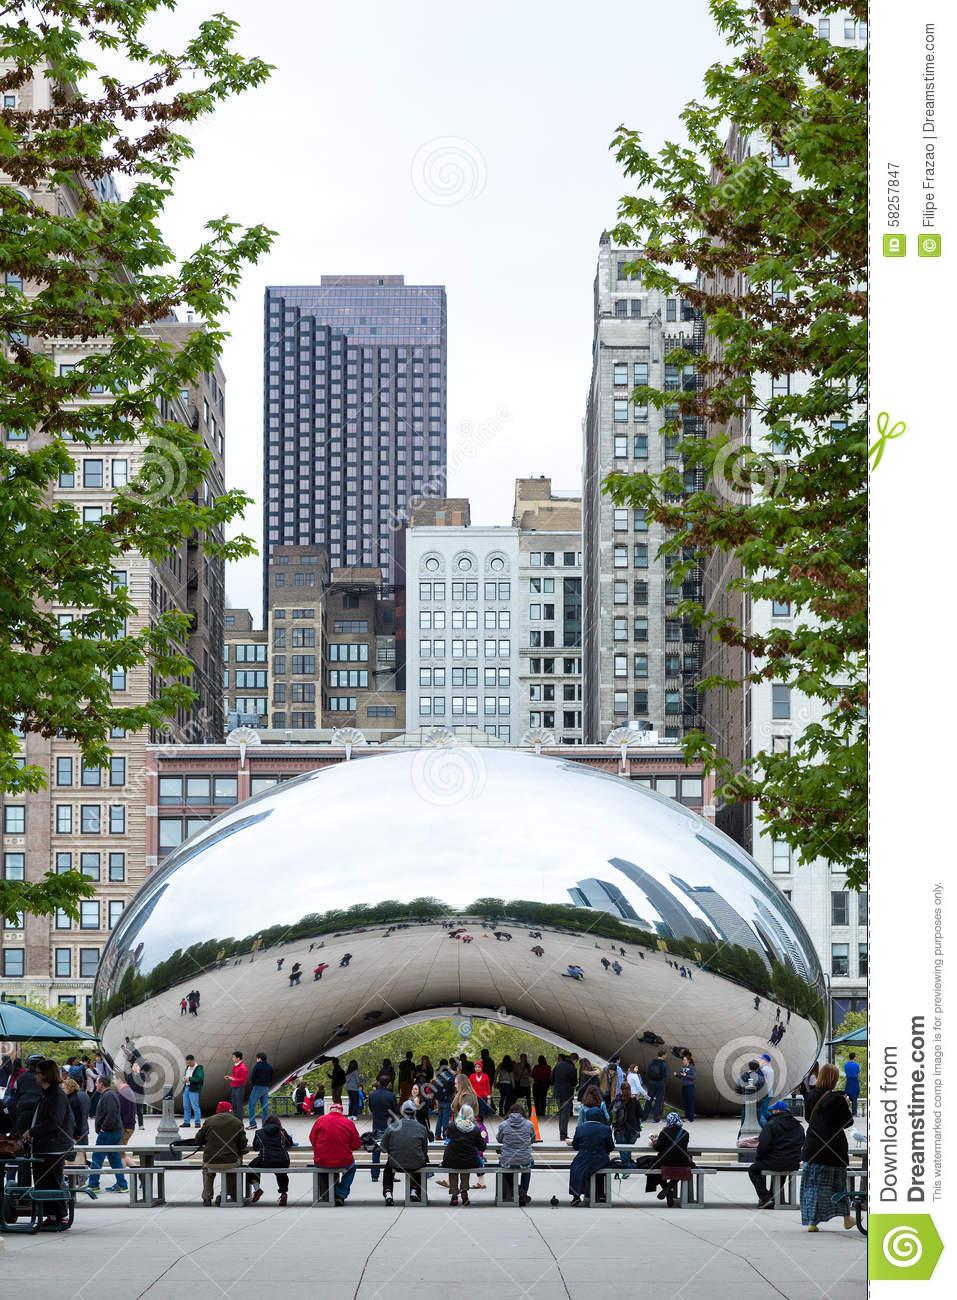 Famous Slivery Bean Sculpture In Chicago Millennium Park In.